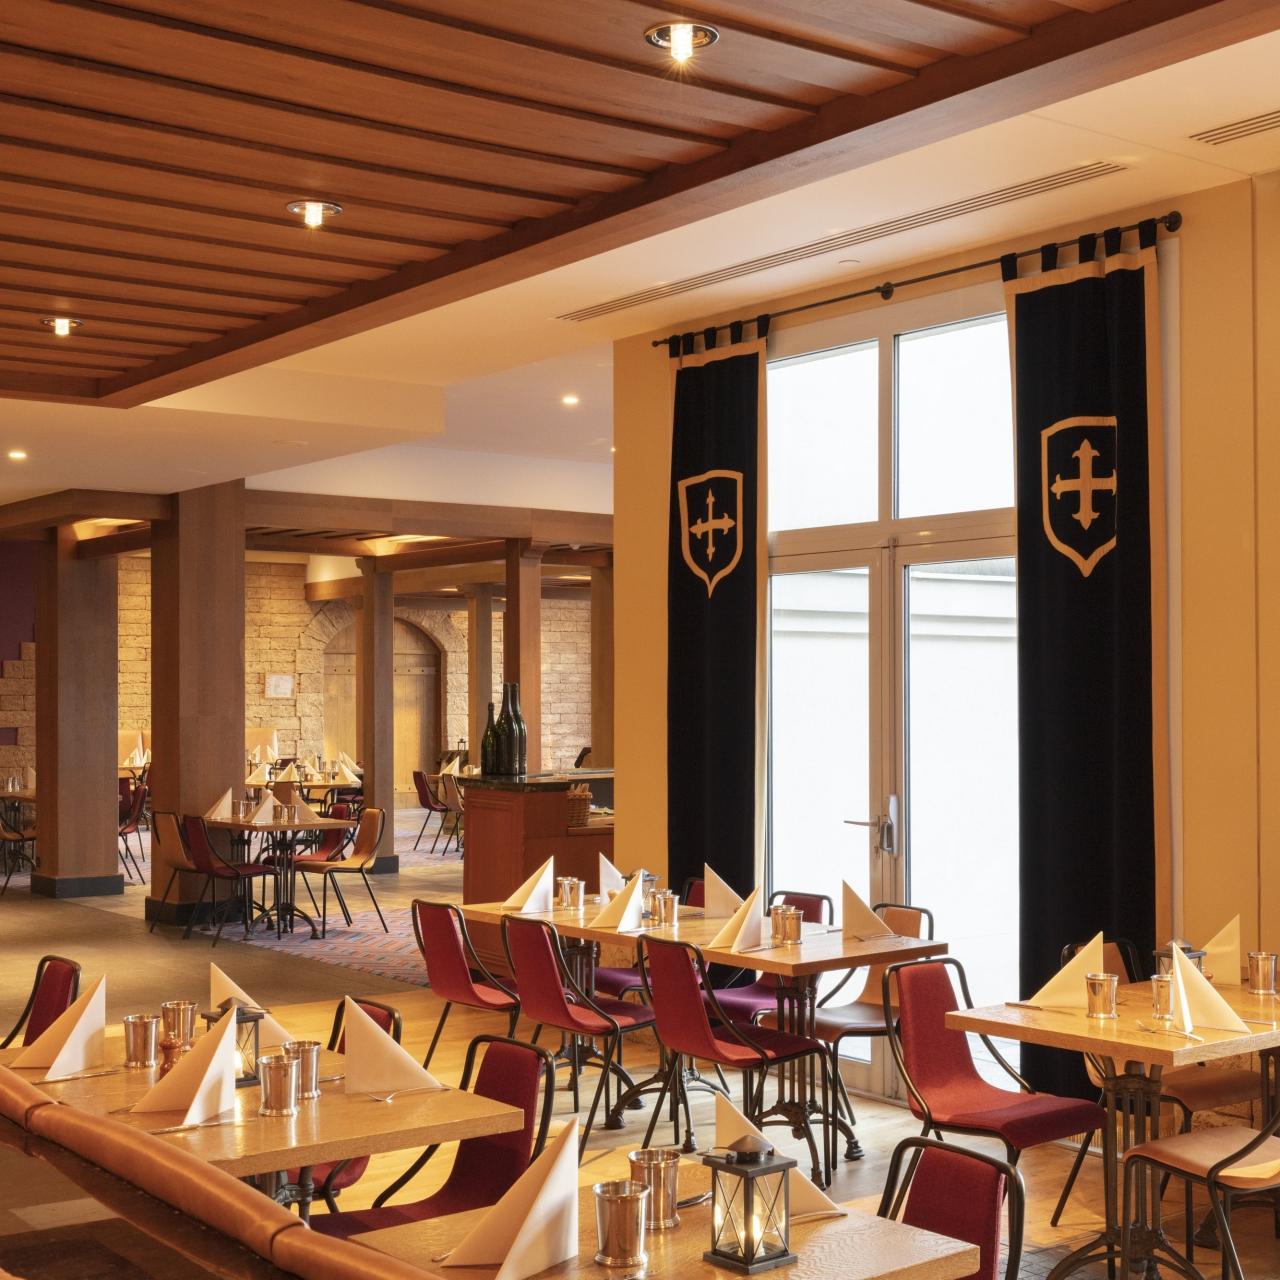 Magny Le Hongre Restaurant magny-le-hongre (Île-de-france) | france | europe | hrs